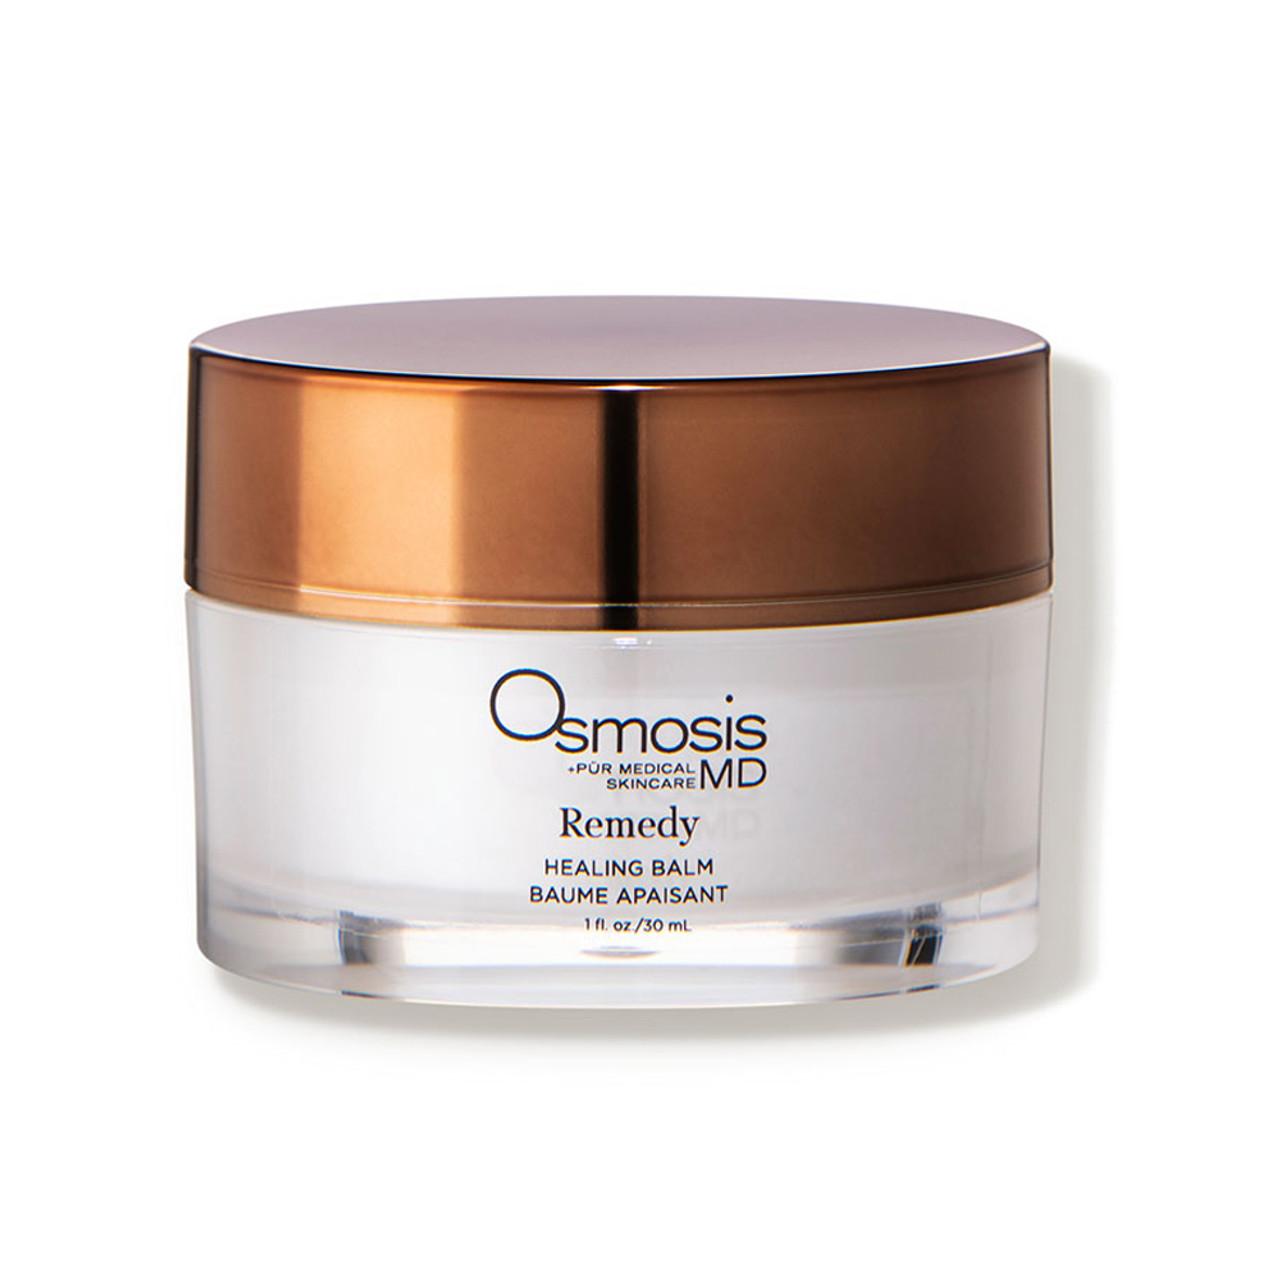 Osmosis +Skincare MD Remedy - Healing Balm BeautifiedYou.com